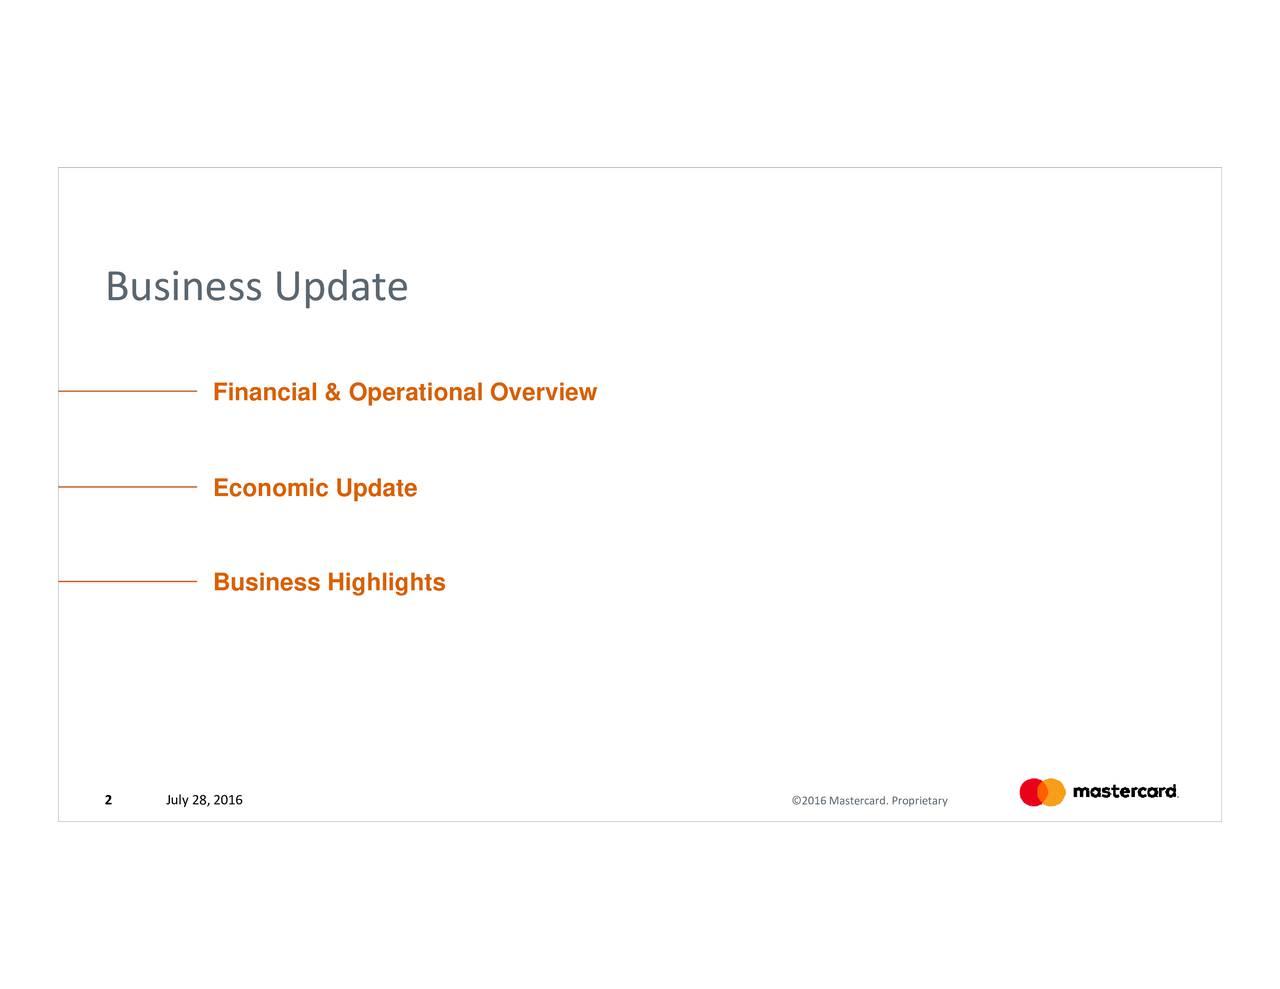 astercard. 2016 Update FinanciaEl conoperatisineatevervhiwght016 8, July Business 2